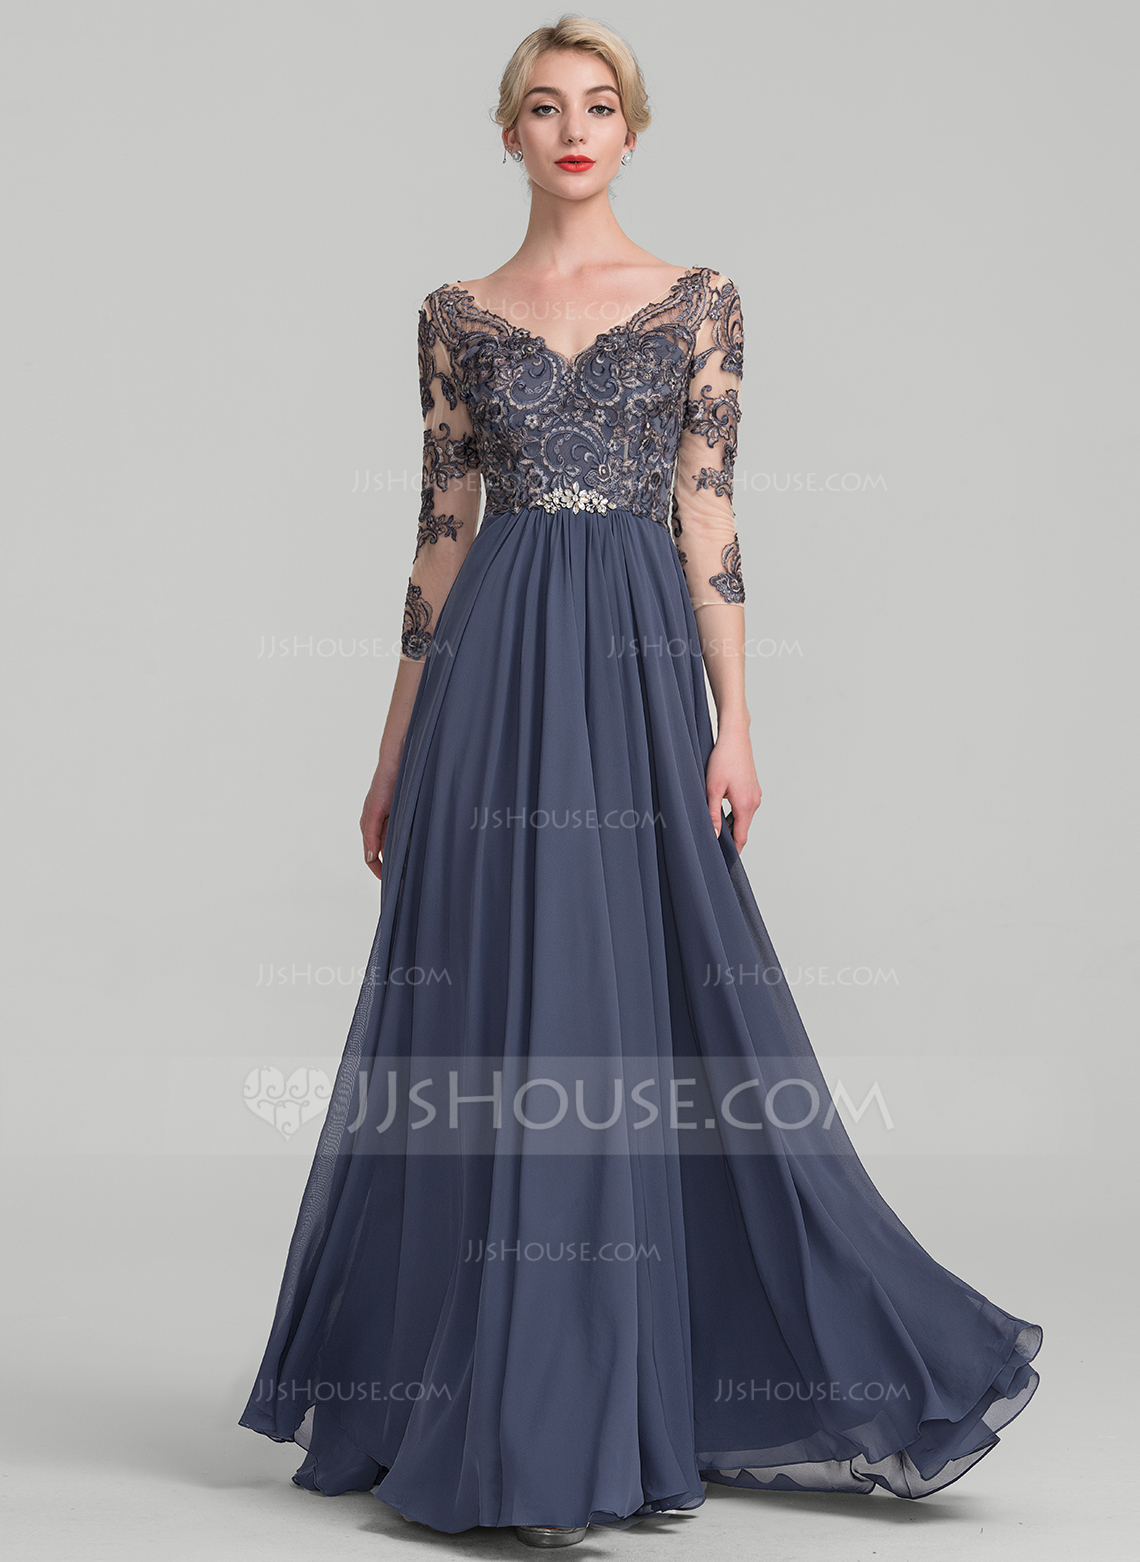 wedding party dresses a-line/princess v-neck floor-length chiffon lace evening dress. loading zoom dpspynt